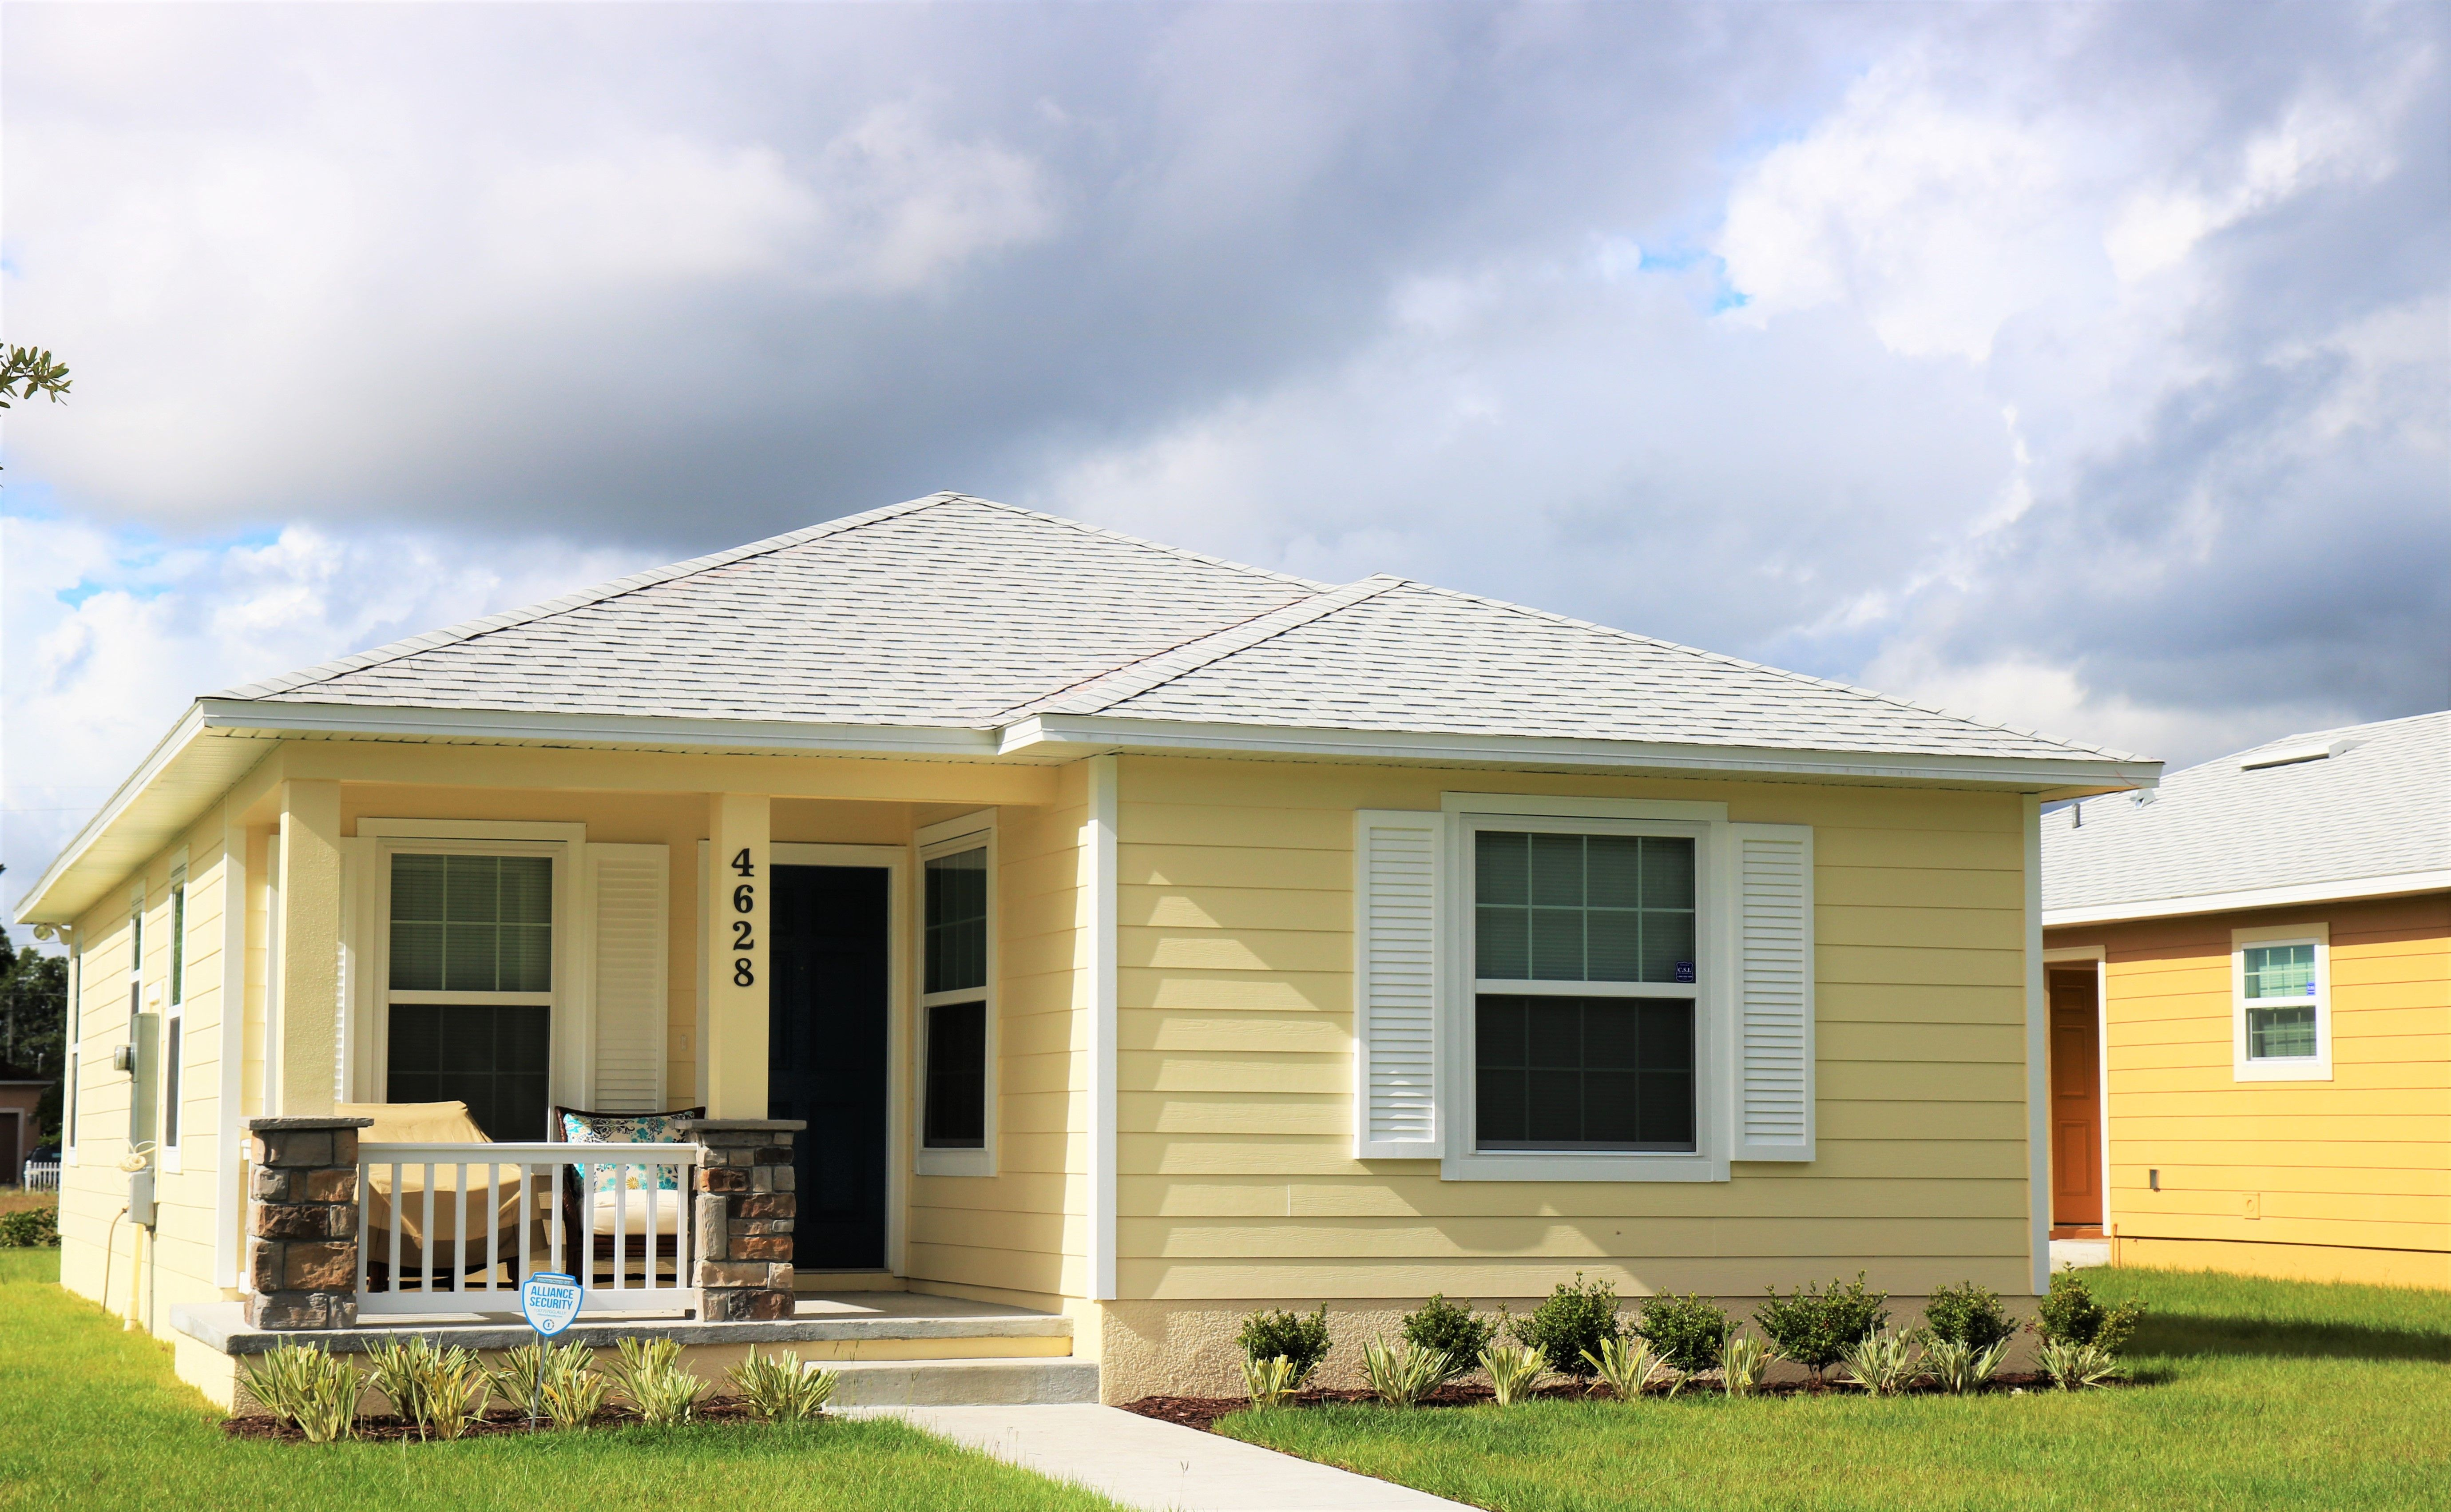 Butler S Preserve Home Affordable Housing Osceola Habitats